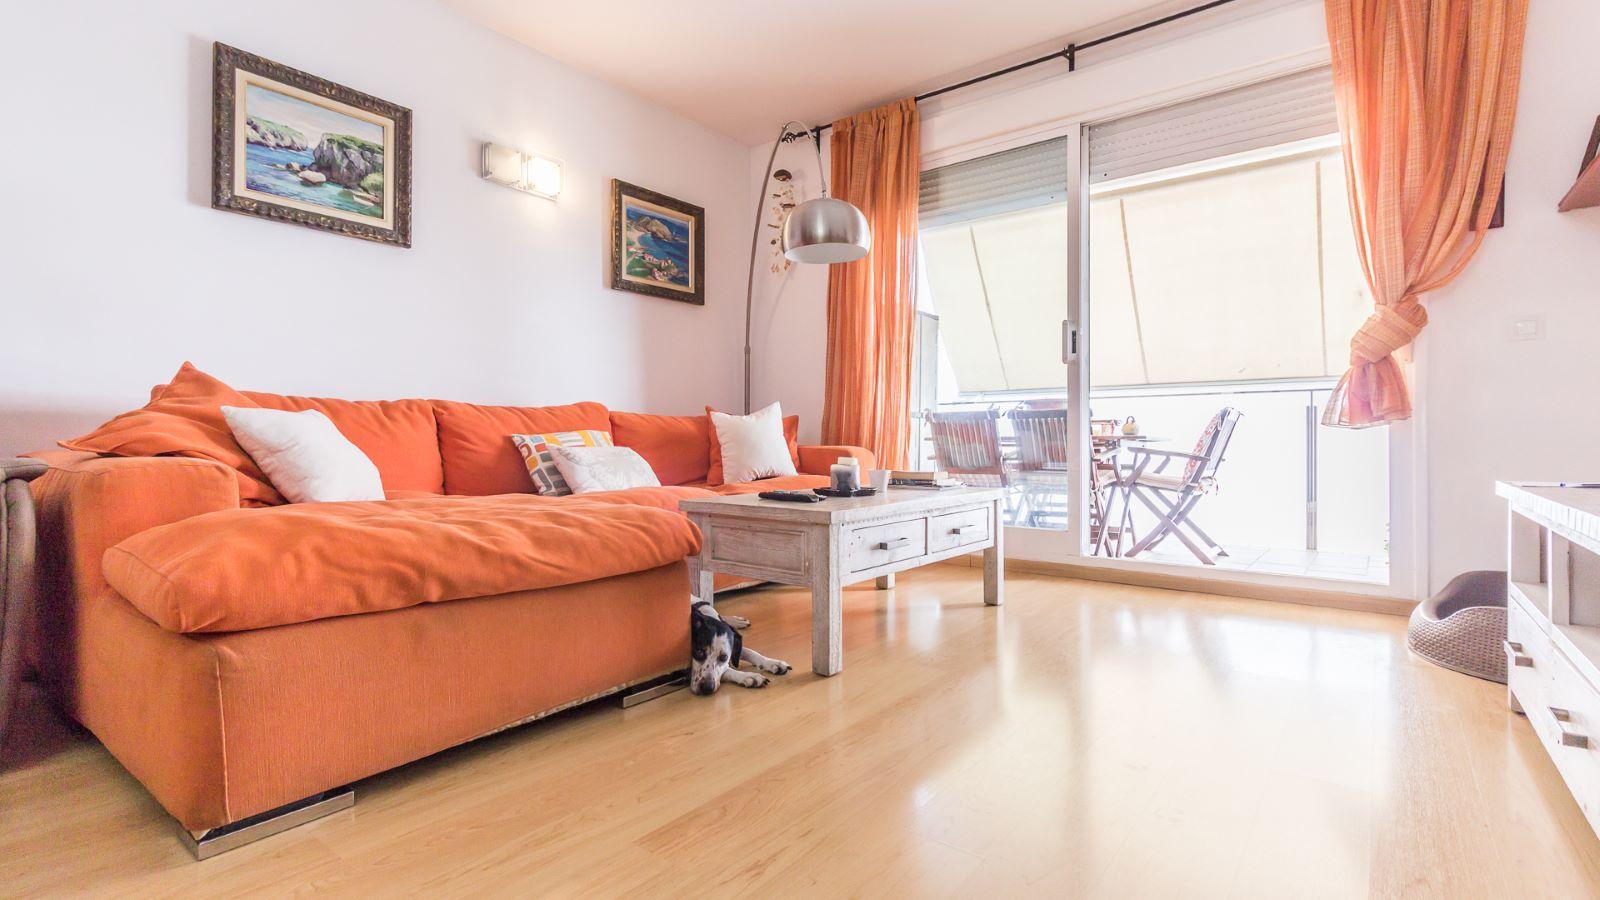 Flat in Zona Vives Llull Ref: HM2359 2